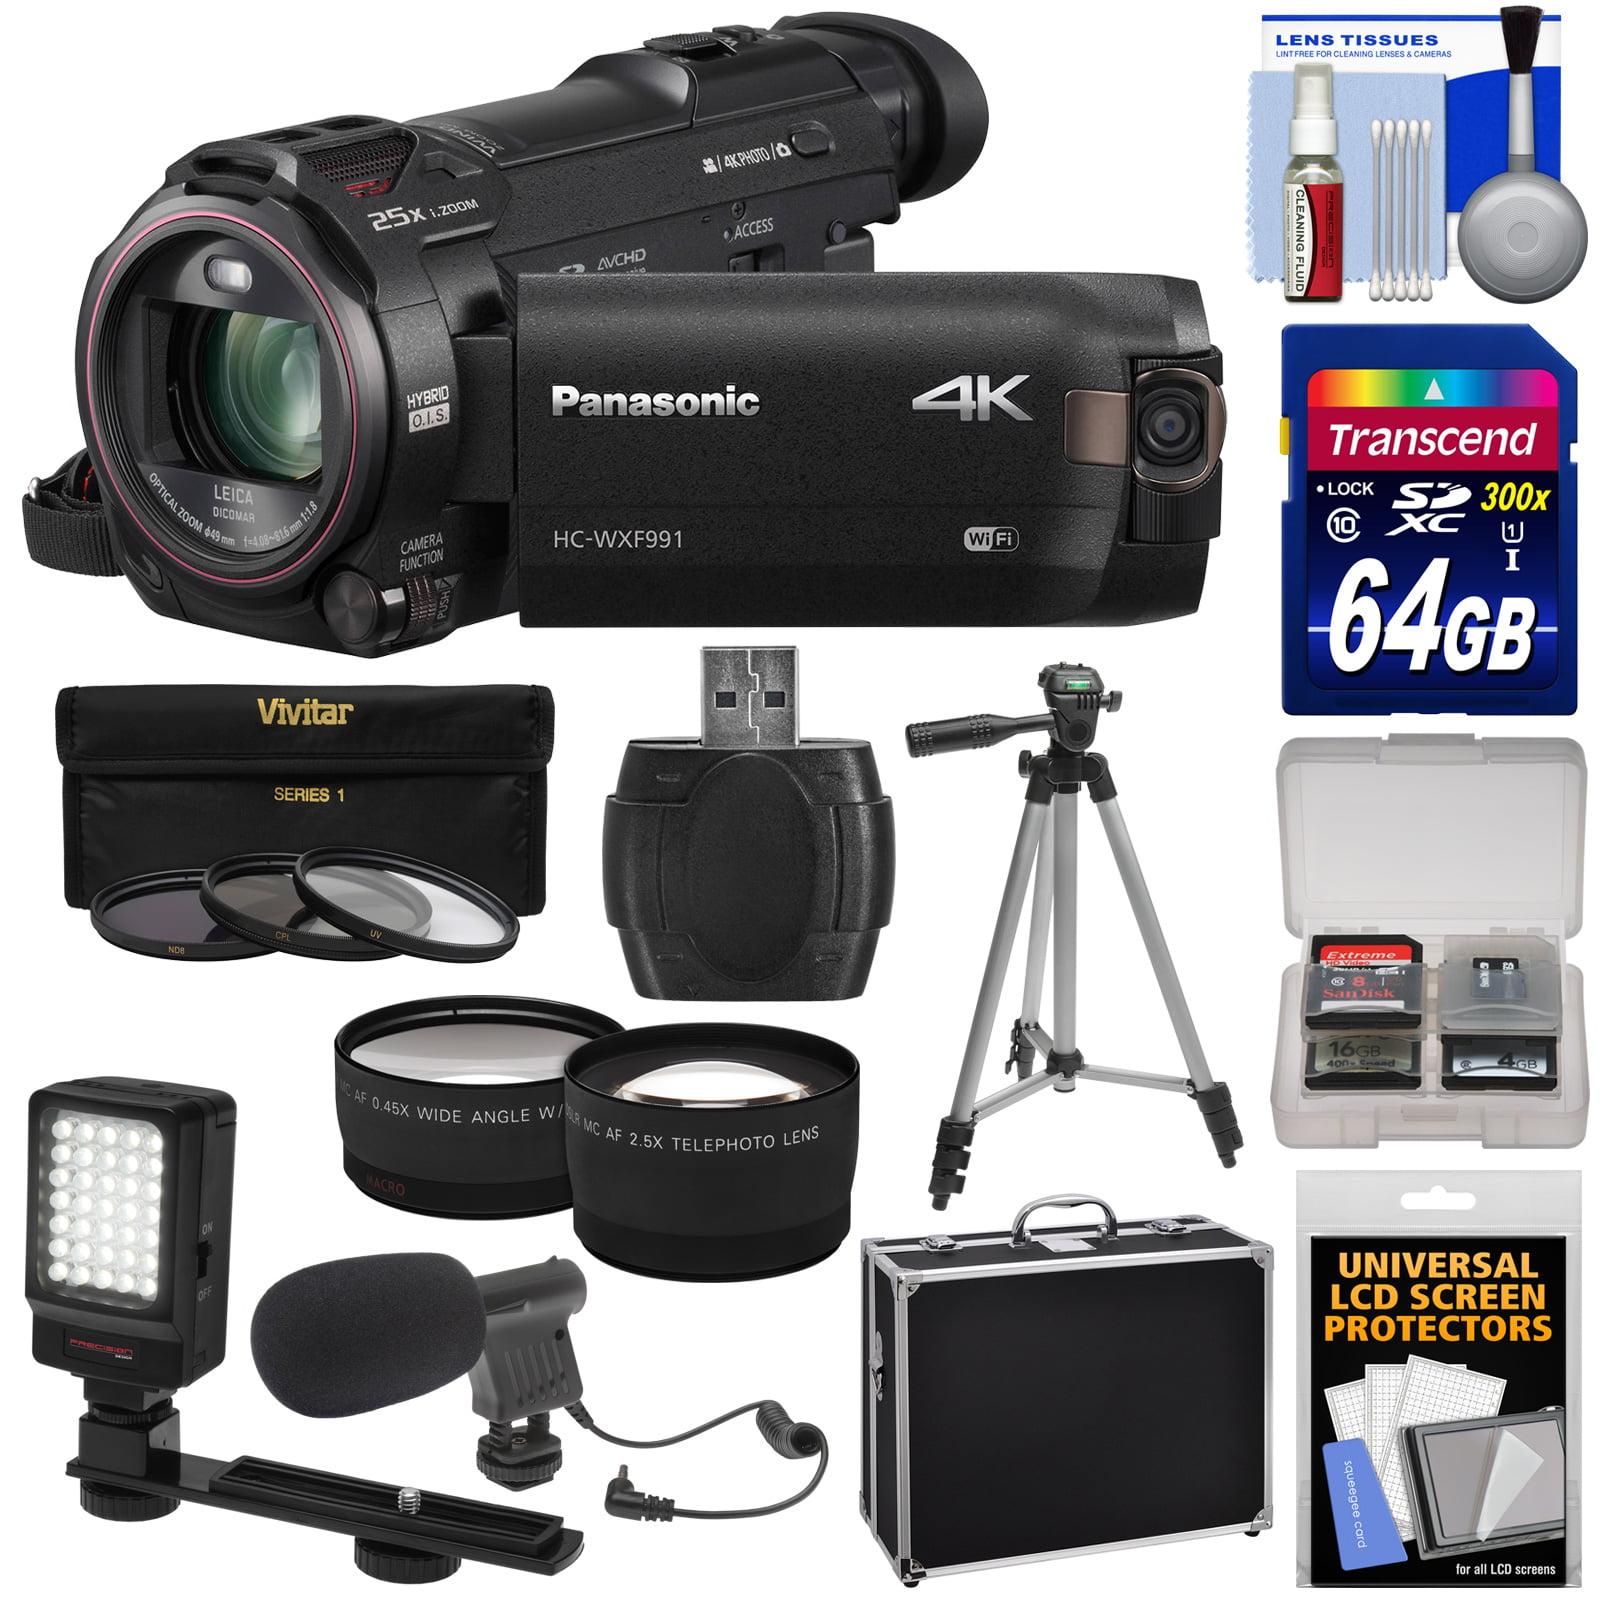 Panasonic HC-WXF991 Wi-Fi 4K Ultra HD Video Camera Camcorder with 64GB Card + Hard Case + Tripod + LED Light + Mic + Filters + Tele/Wide Lens Kit